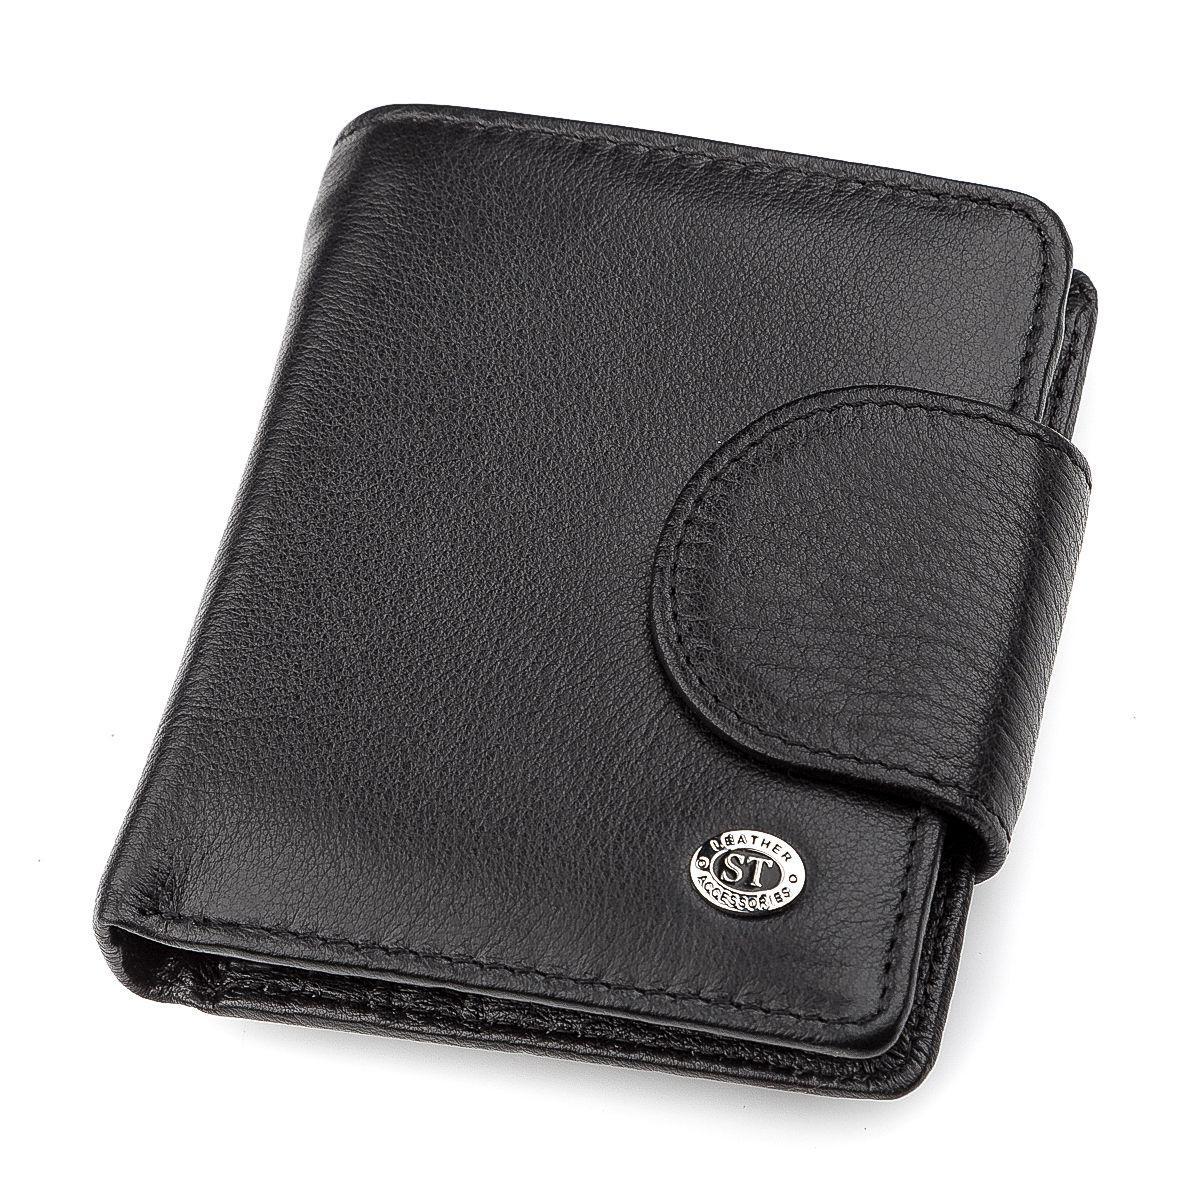 Кошелек женский ST Leather 18497 (ST415) кожаный Черный, Черный